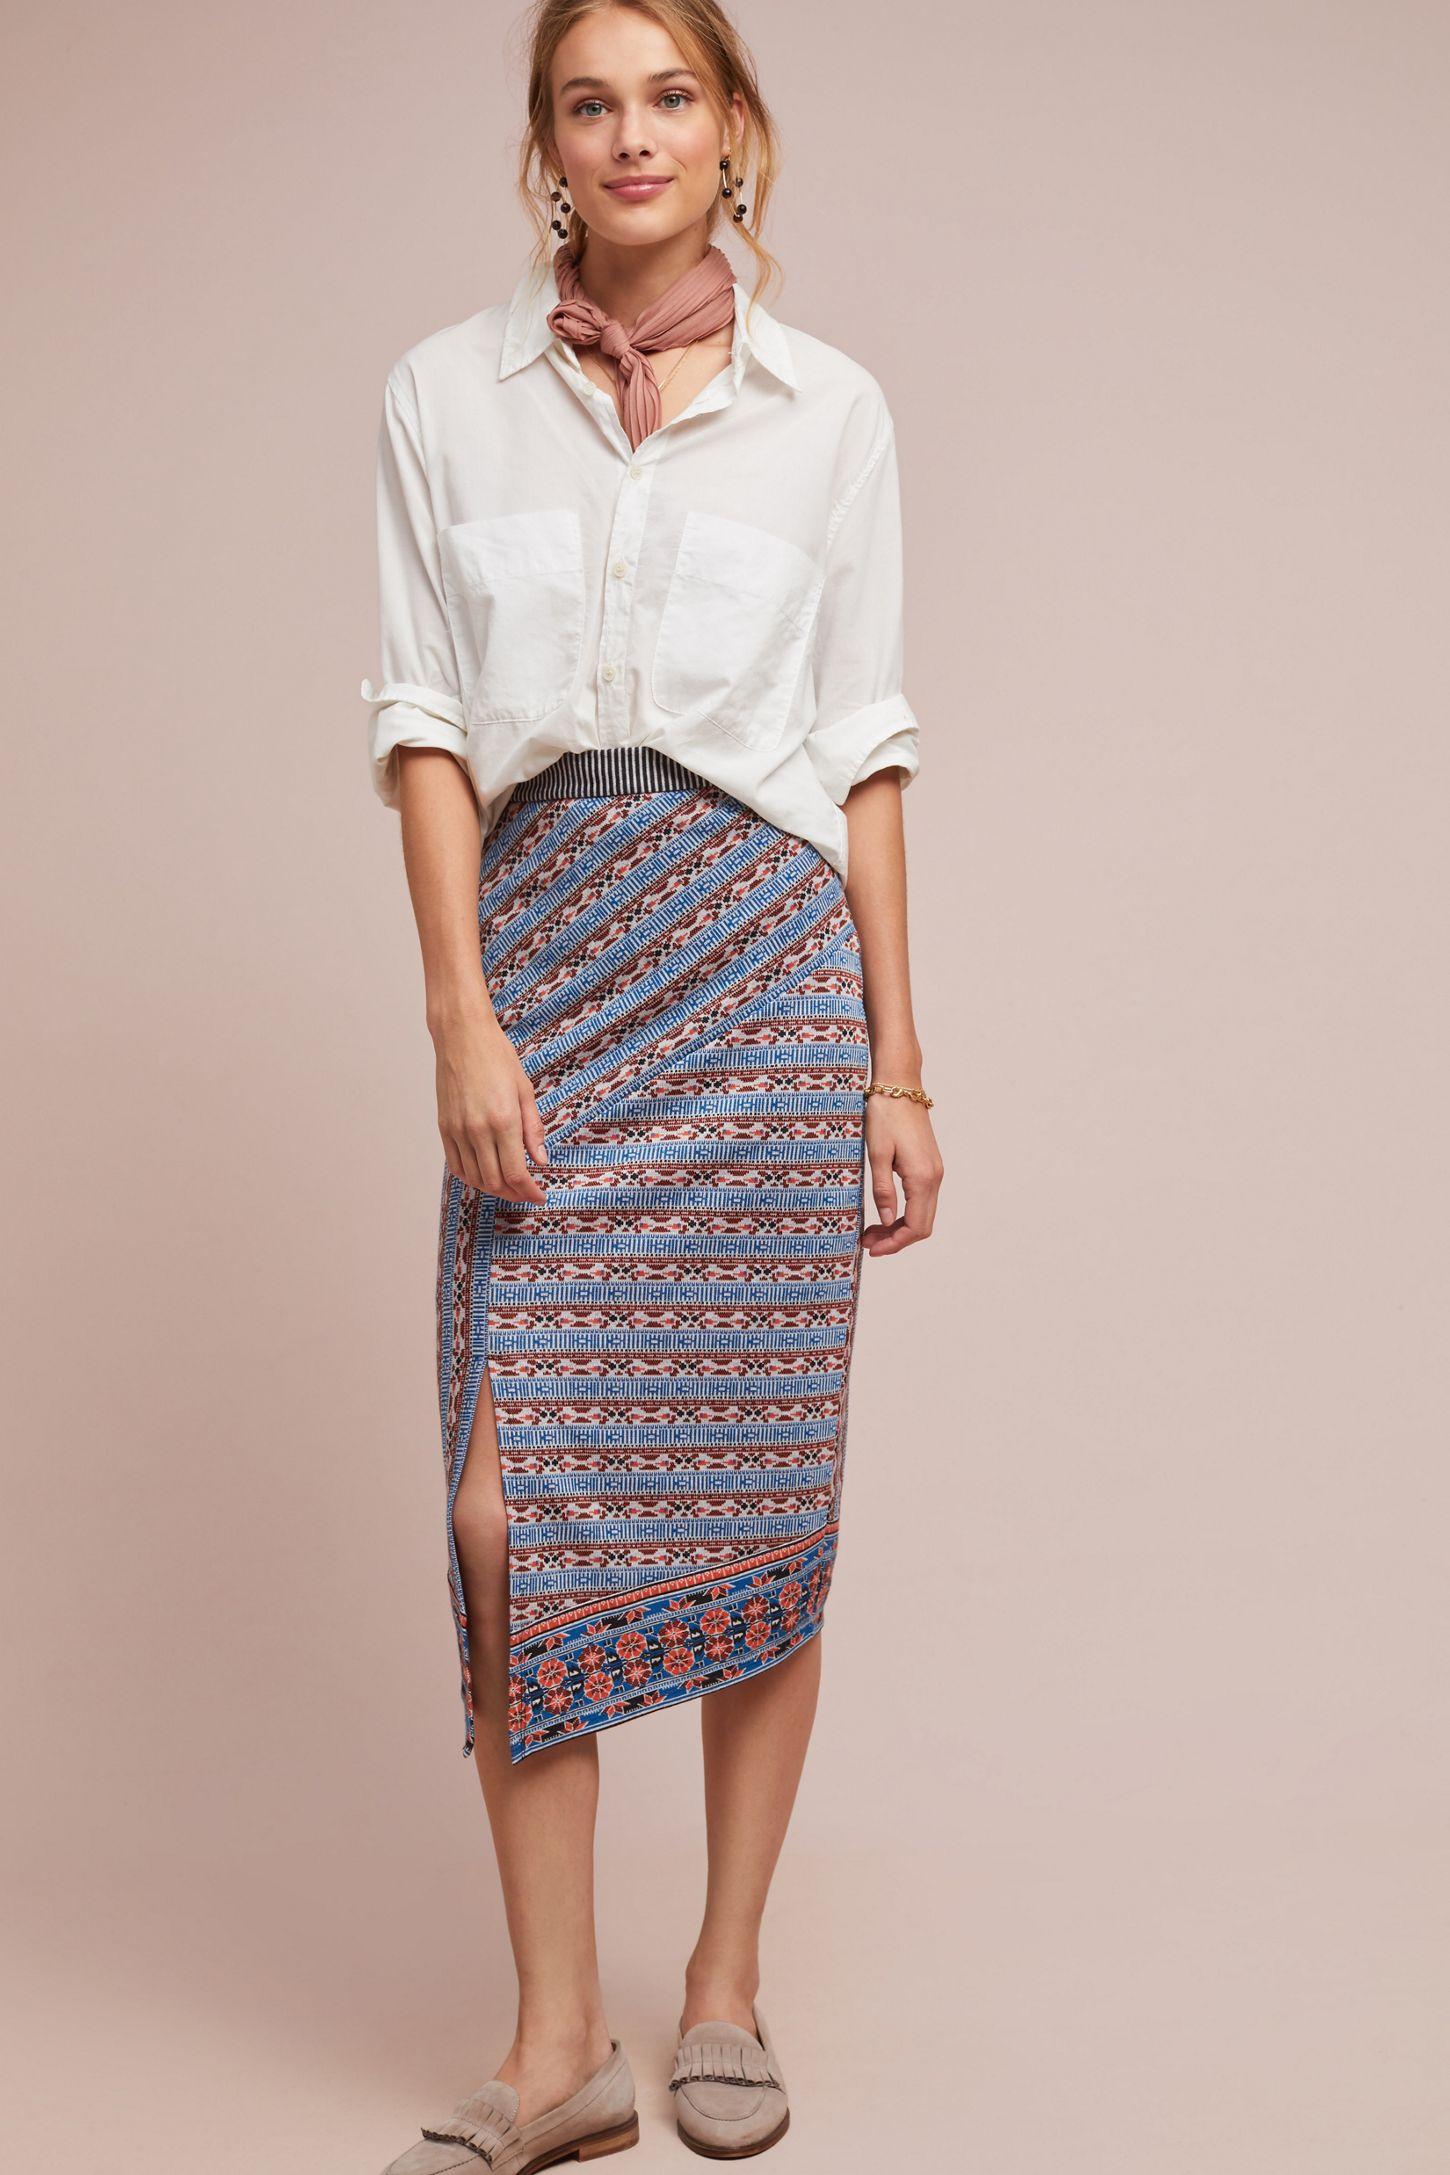 8593d2730b266 Striped Splendor Pencil Skirt